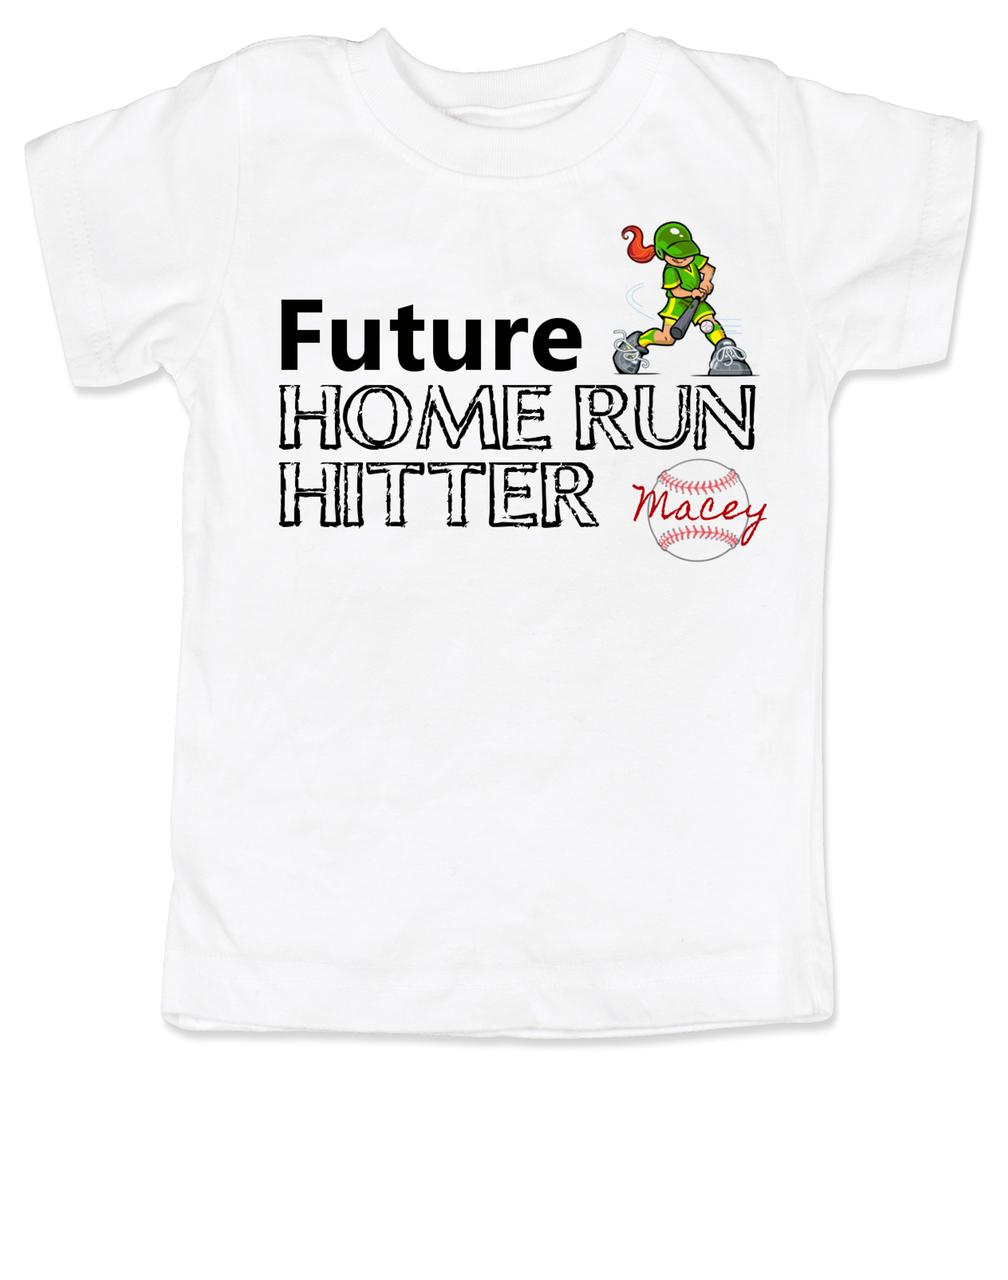 9ef683f8c Future Home Run Hitter toddler shirt, Future Baseball Player, Play Ball,  Girl Softball